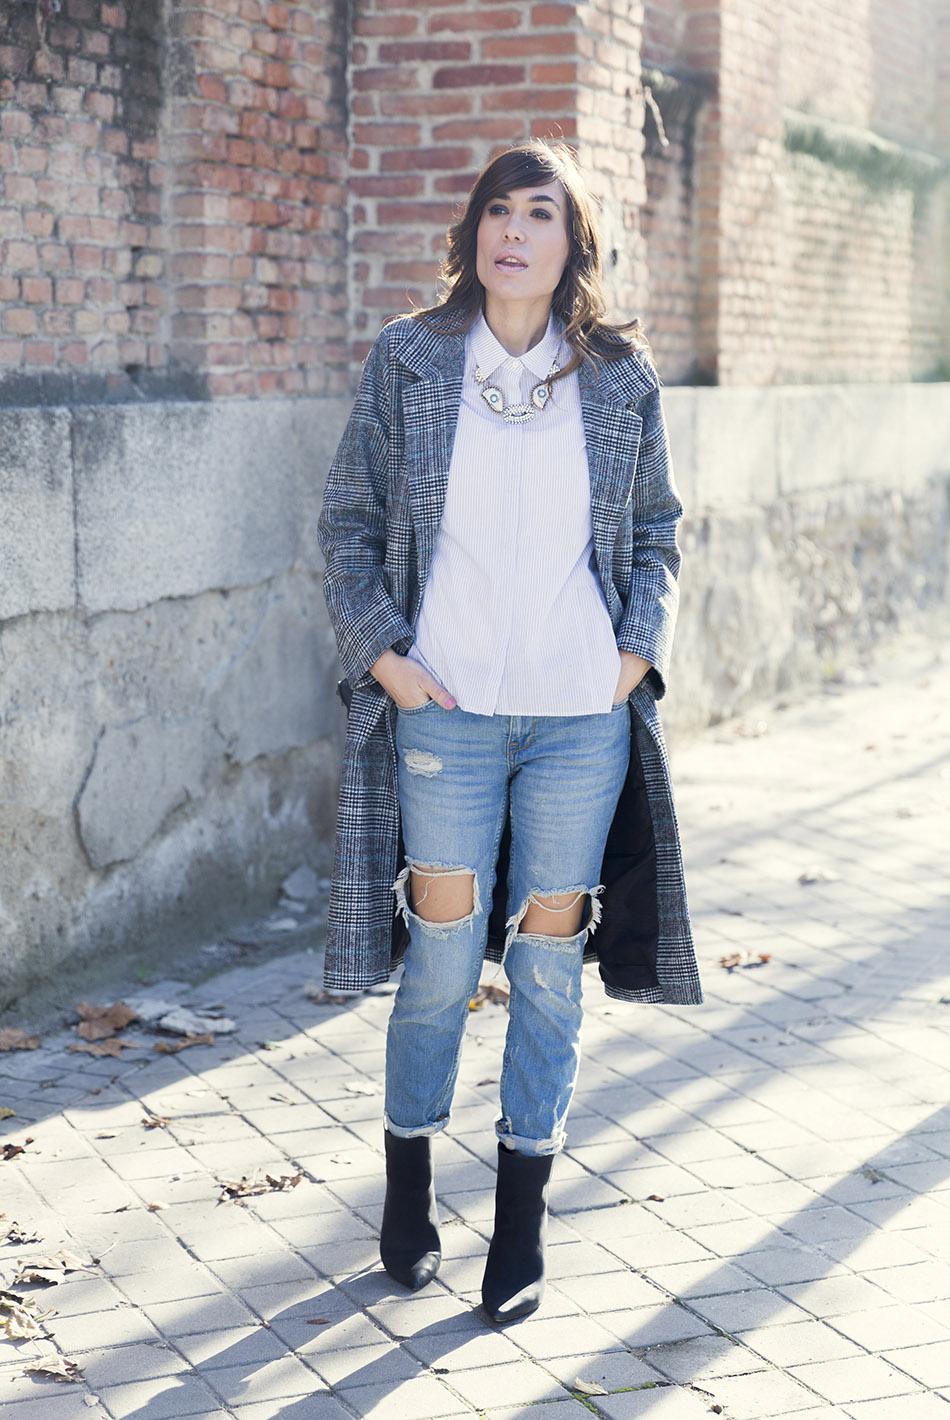 street-style-mango-necklace-hakei-bag-mango-boots-denim-jeans-07